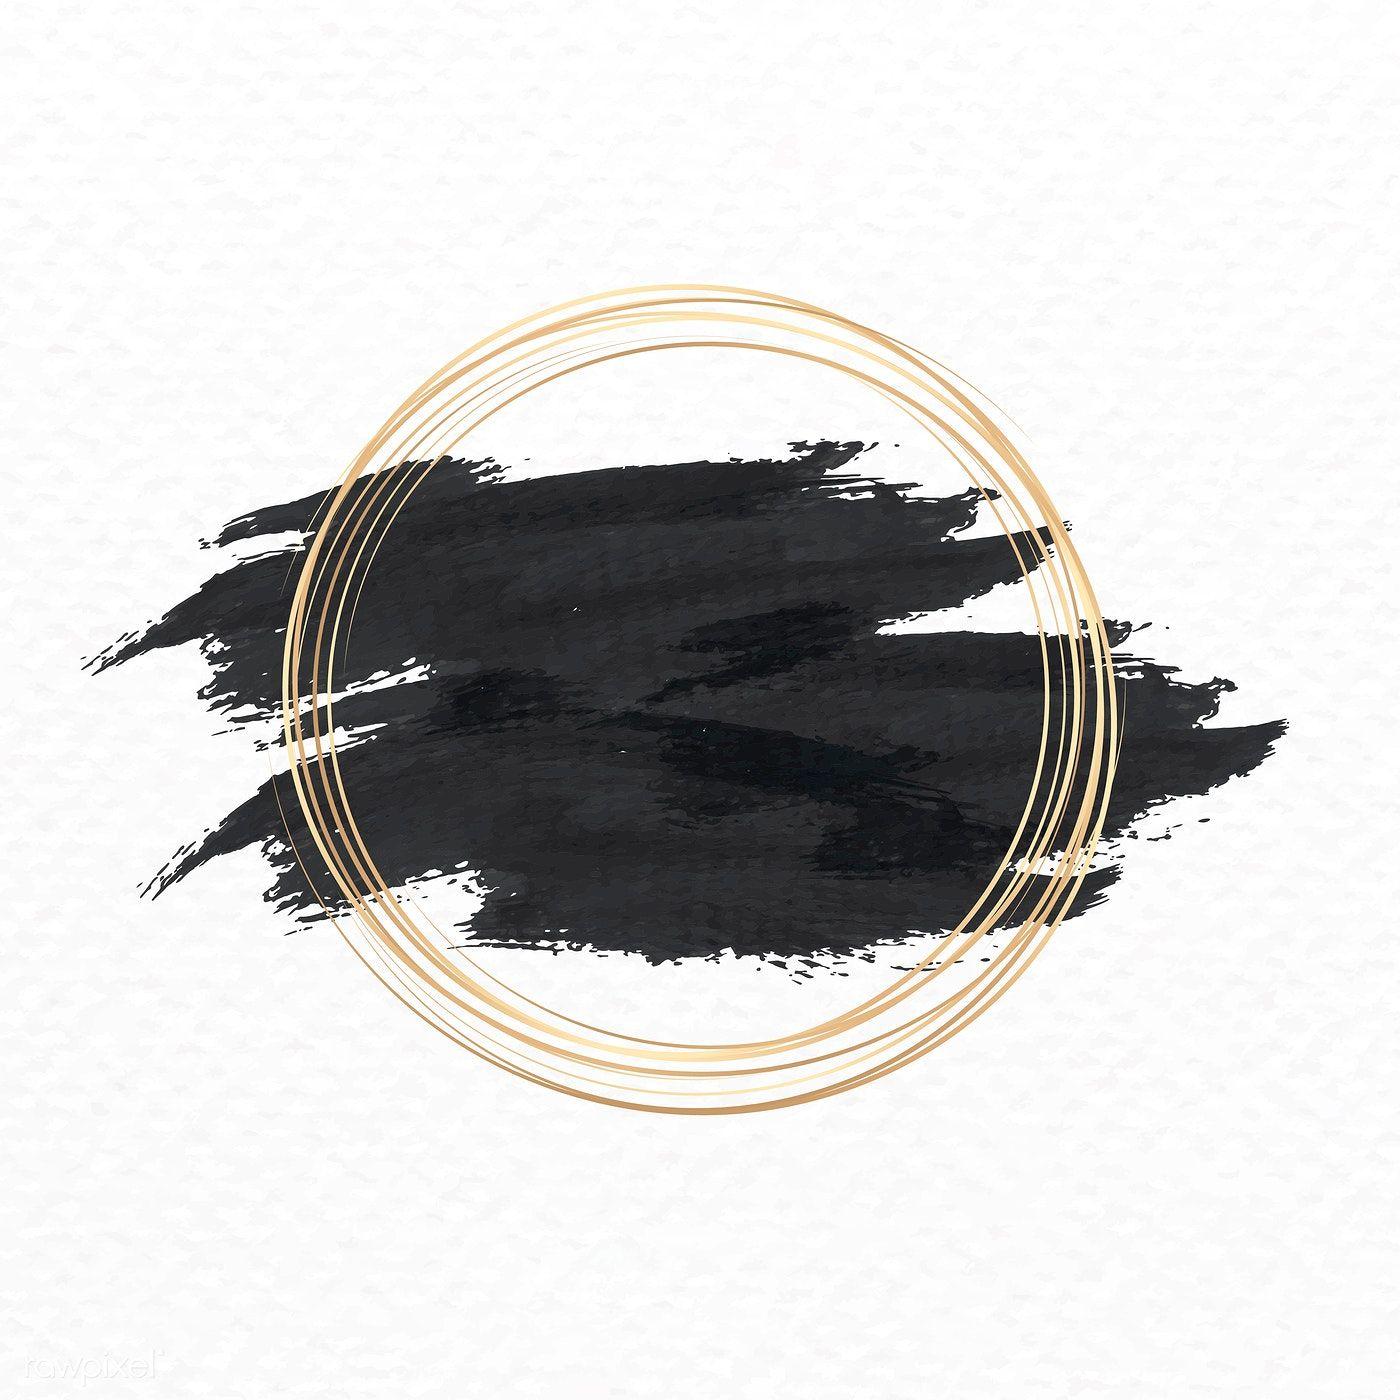 Download Premium Vector Of Gold Circle Frame On A Black Background Vector In 2020 Gold Circle Frames Circle Frames Instagram Background